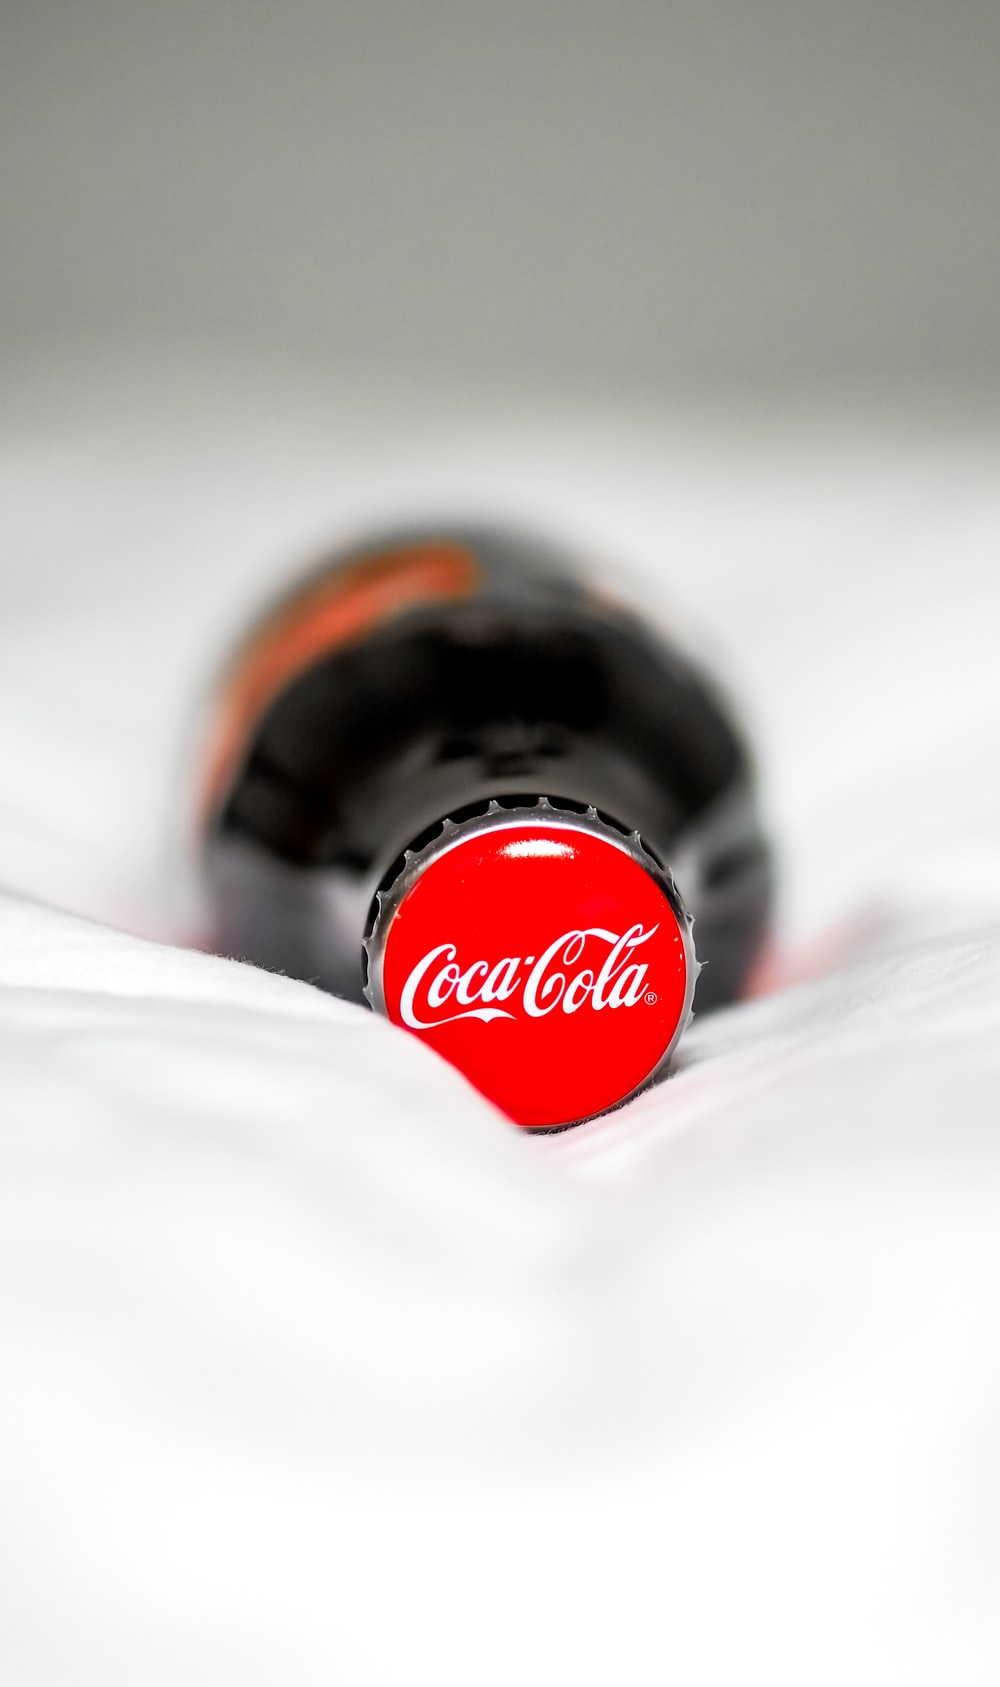 coca cola bottle on white textile